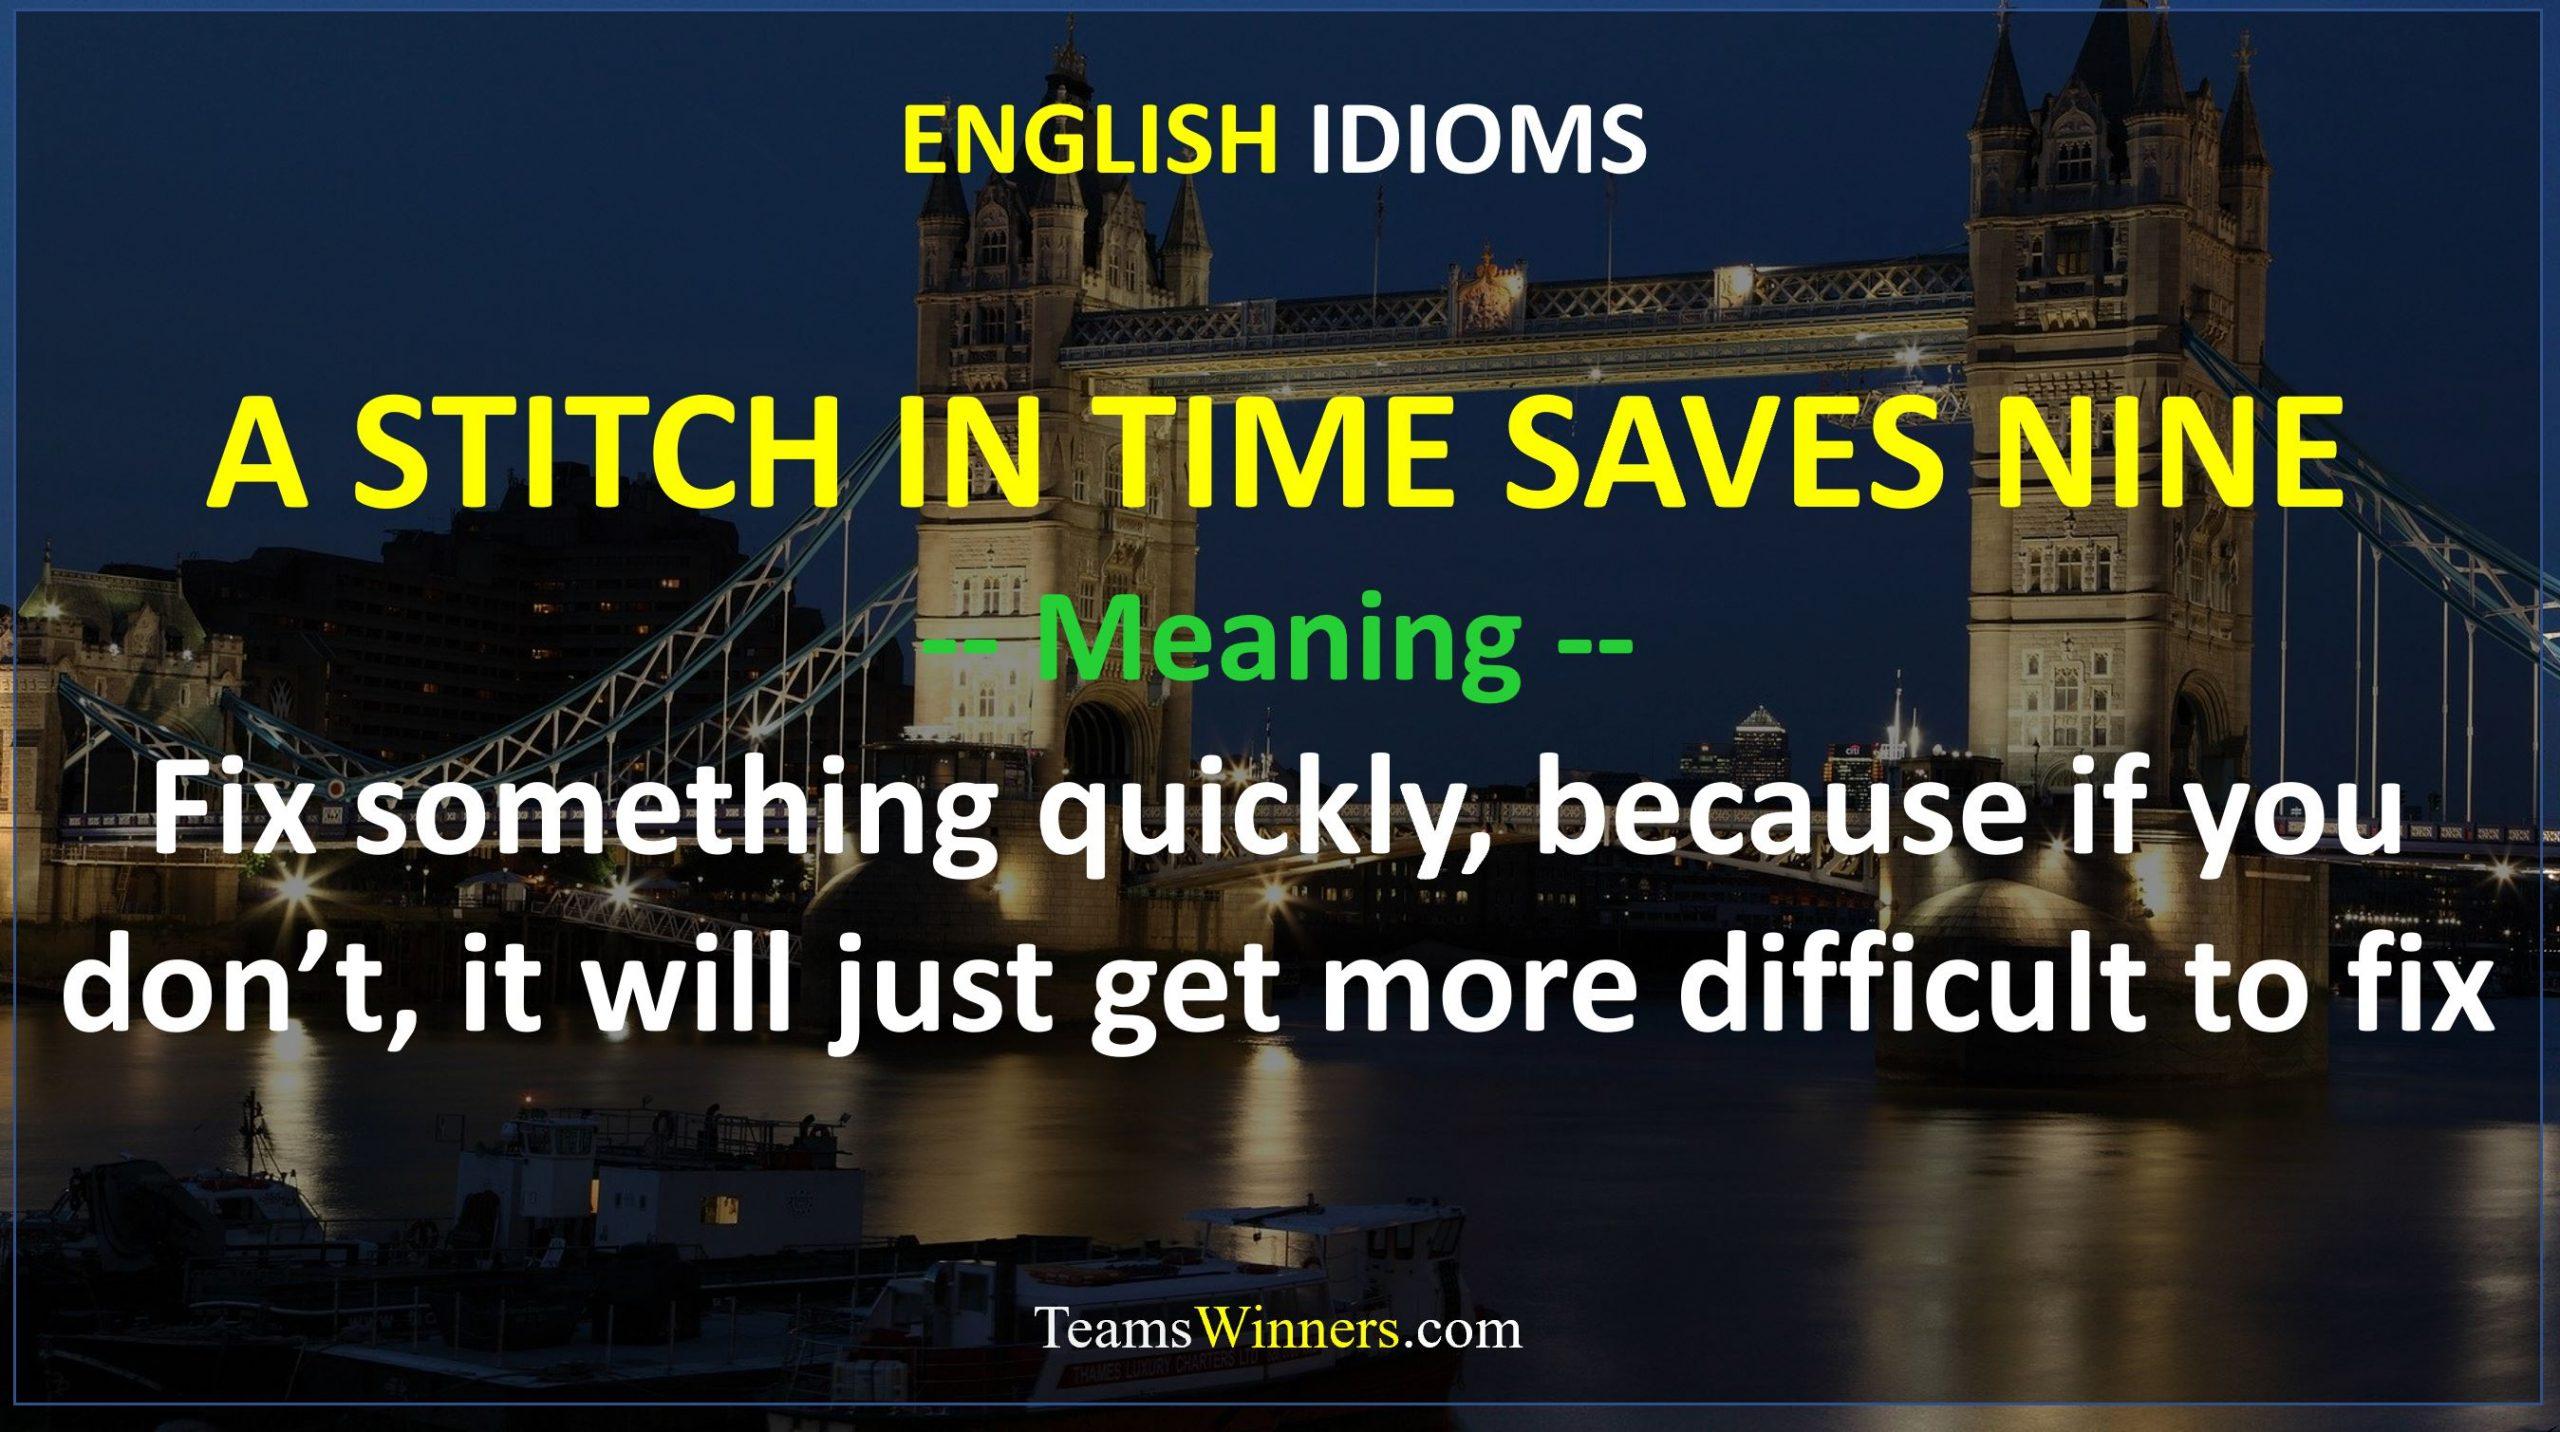 English Idiom - A Stitch in Time Saves Nine